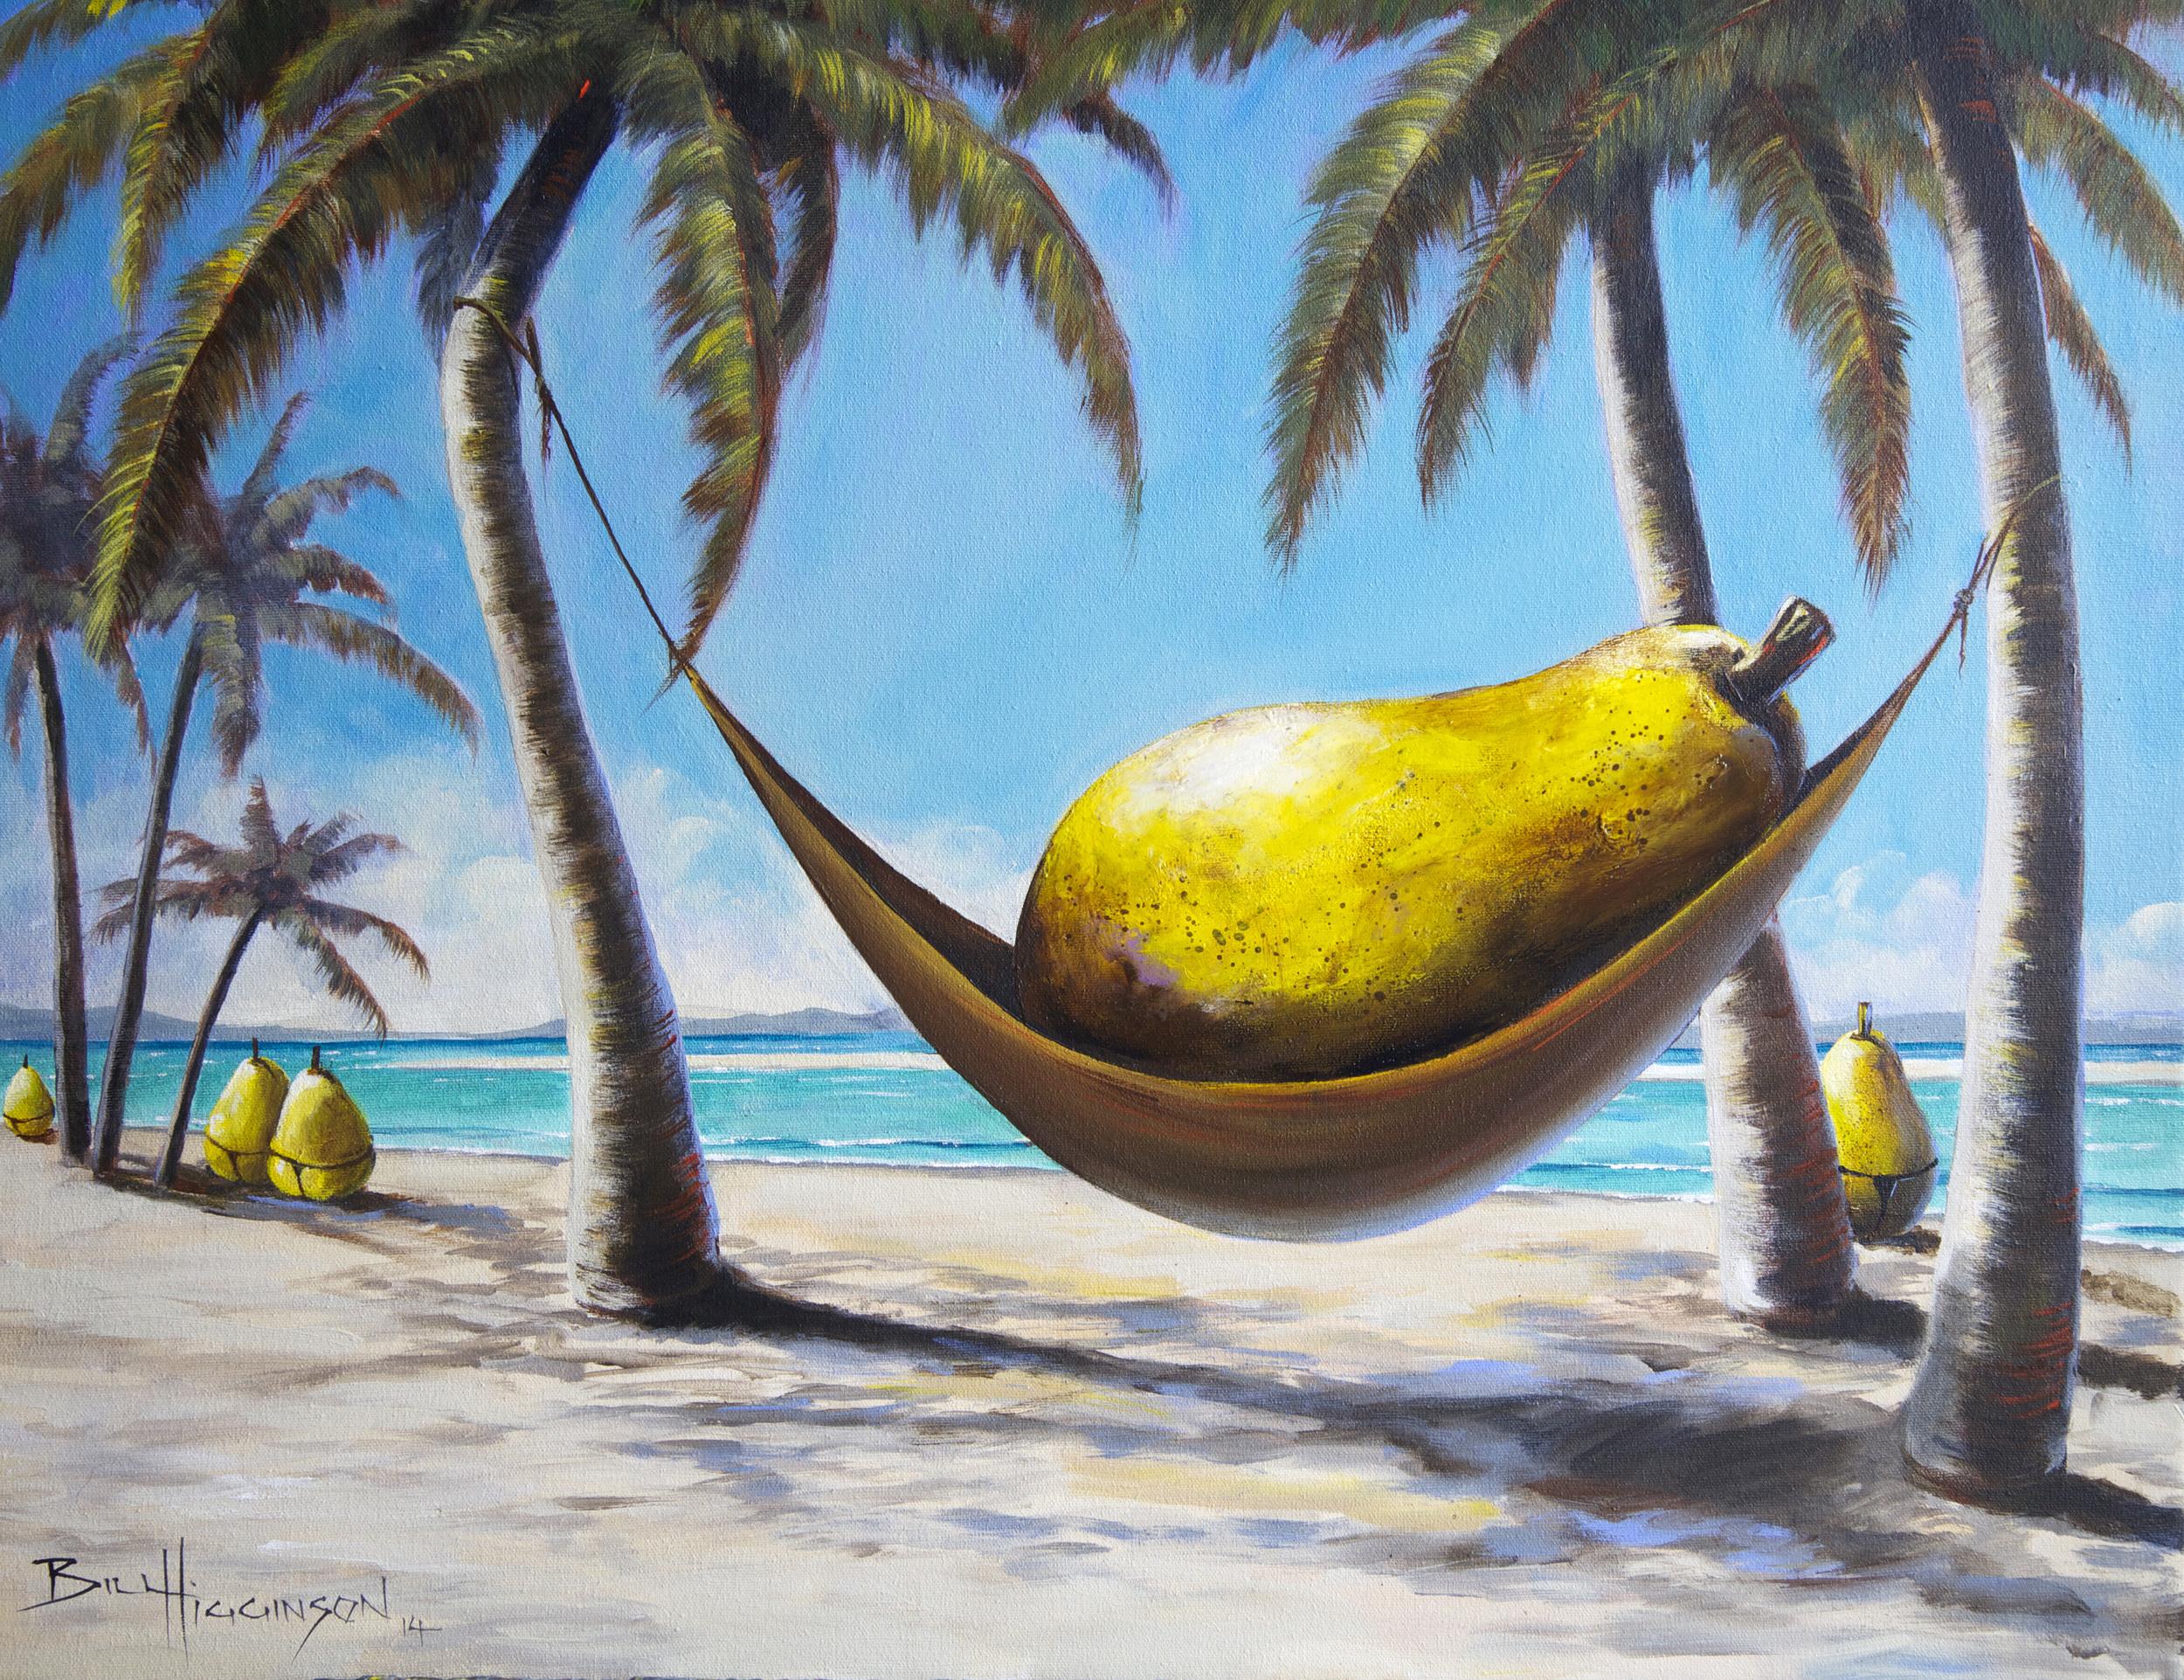 """A Relaxed Pear""           24"" x 30 "", Acrylic on canvas"